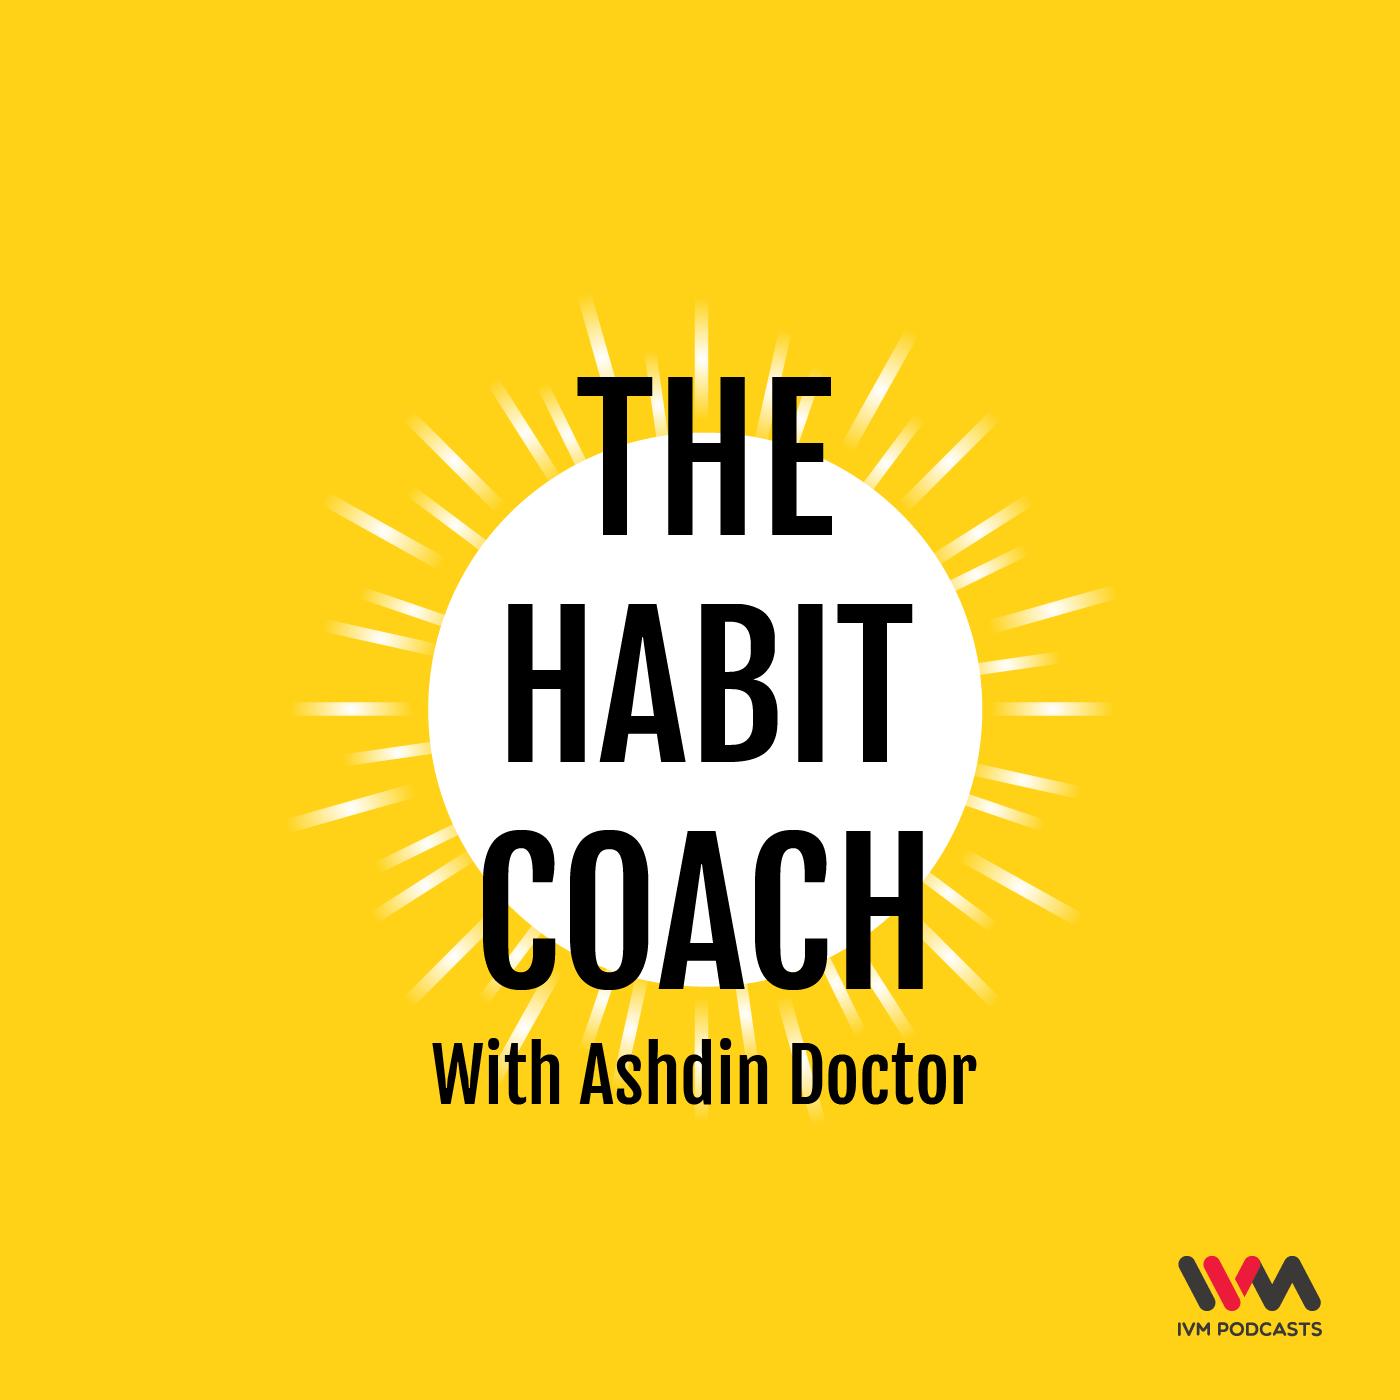 The Habit Coach